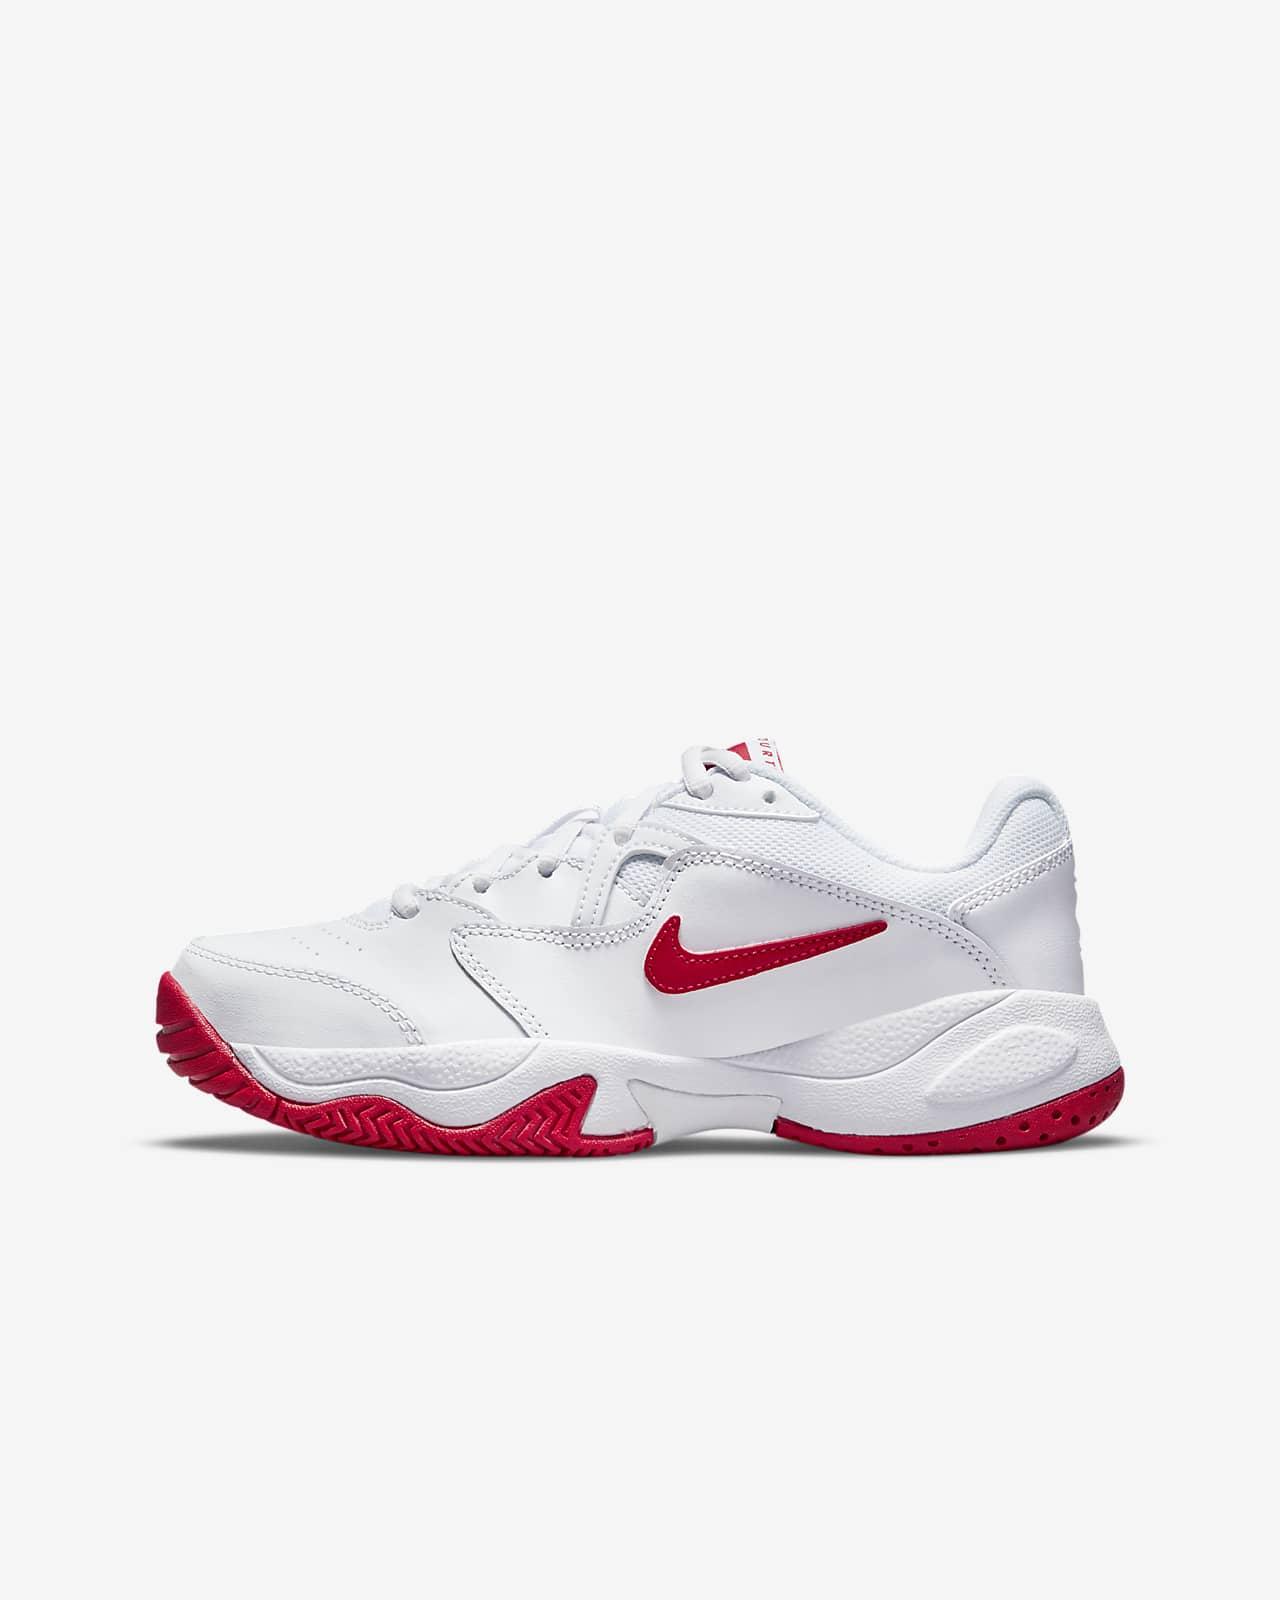 NikeCourt Jr. Lite 2 Older Kids' Tennis Shoe